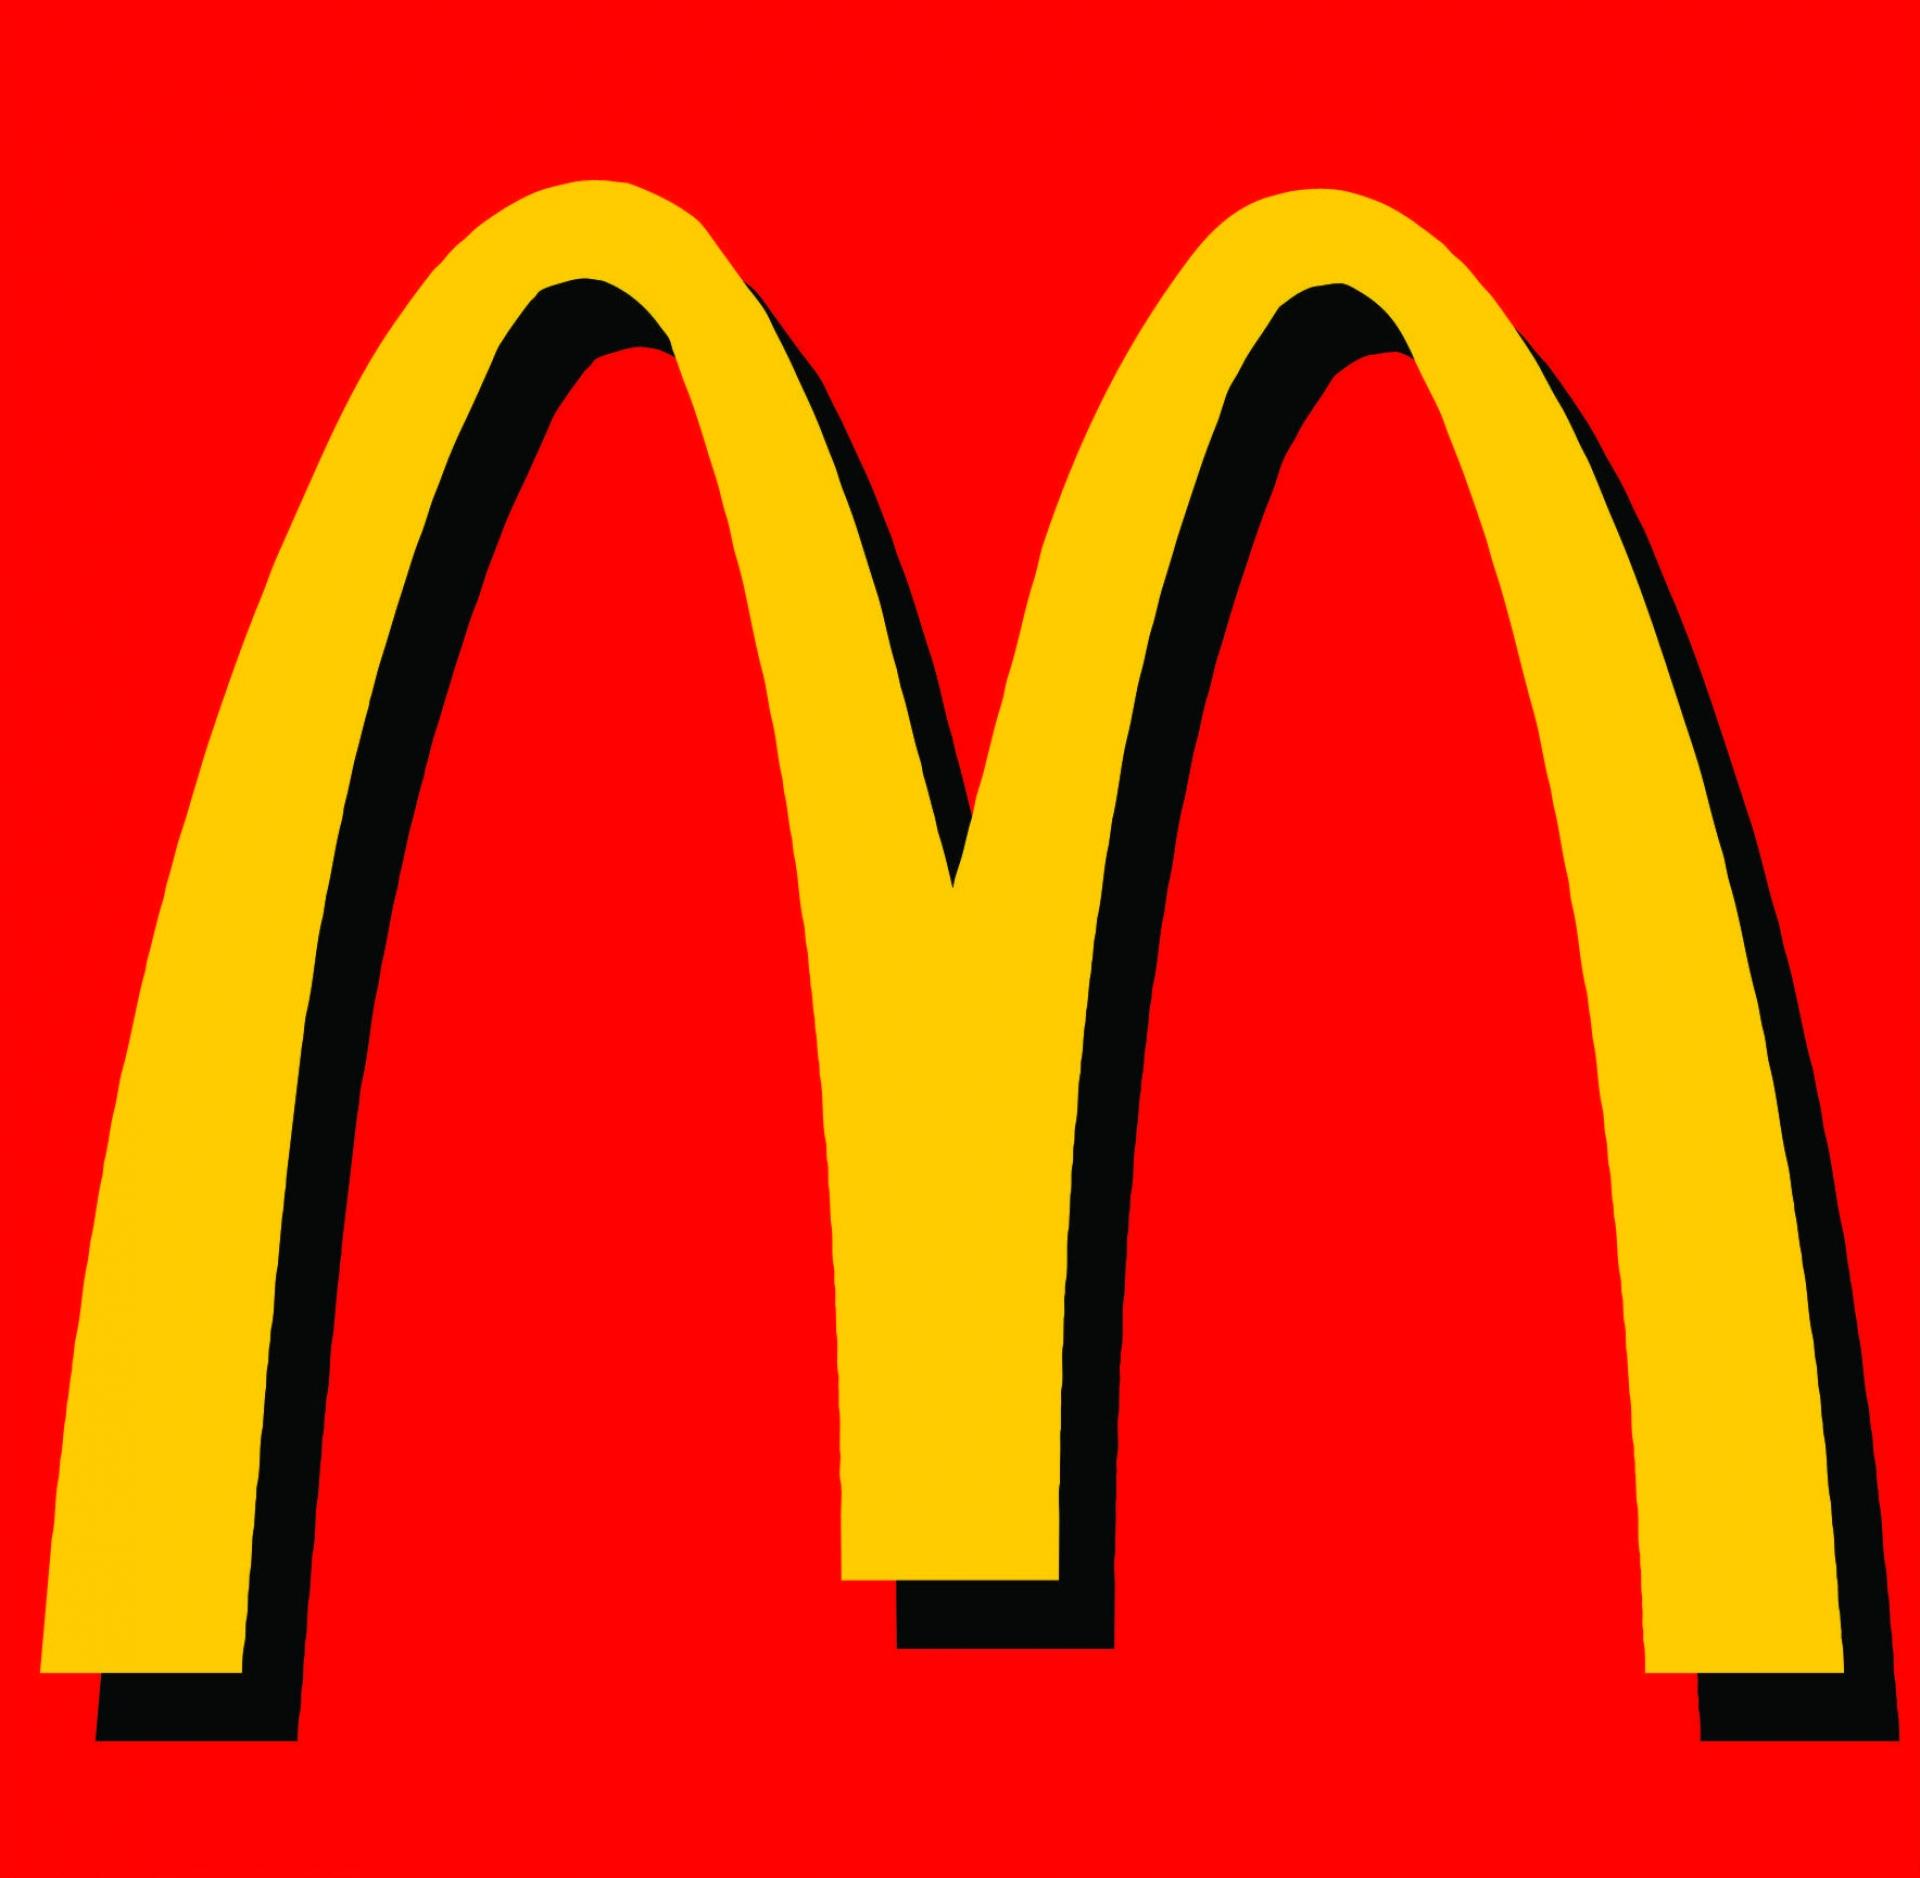 Plain-mcdonalds-logo.jpg